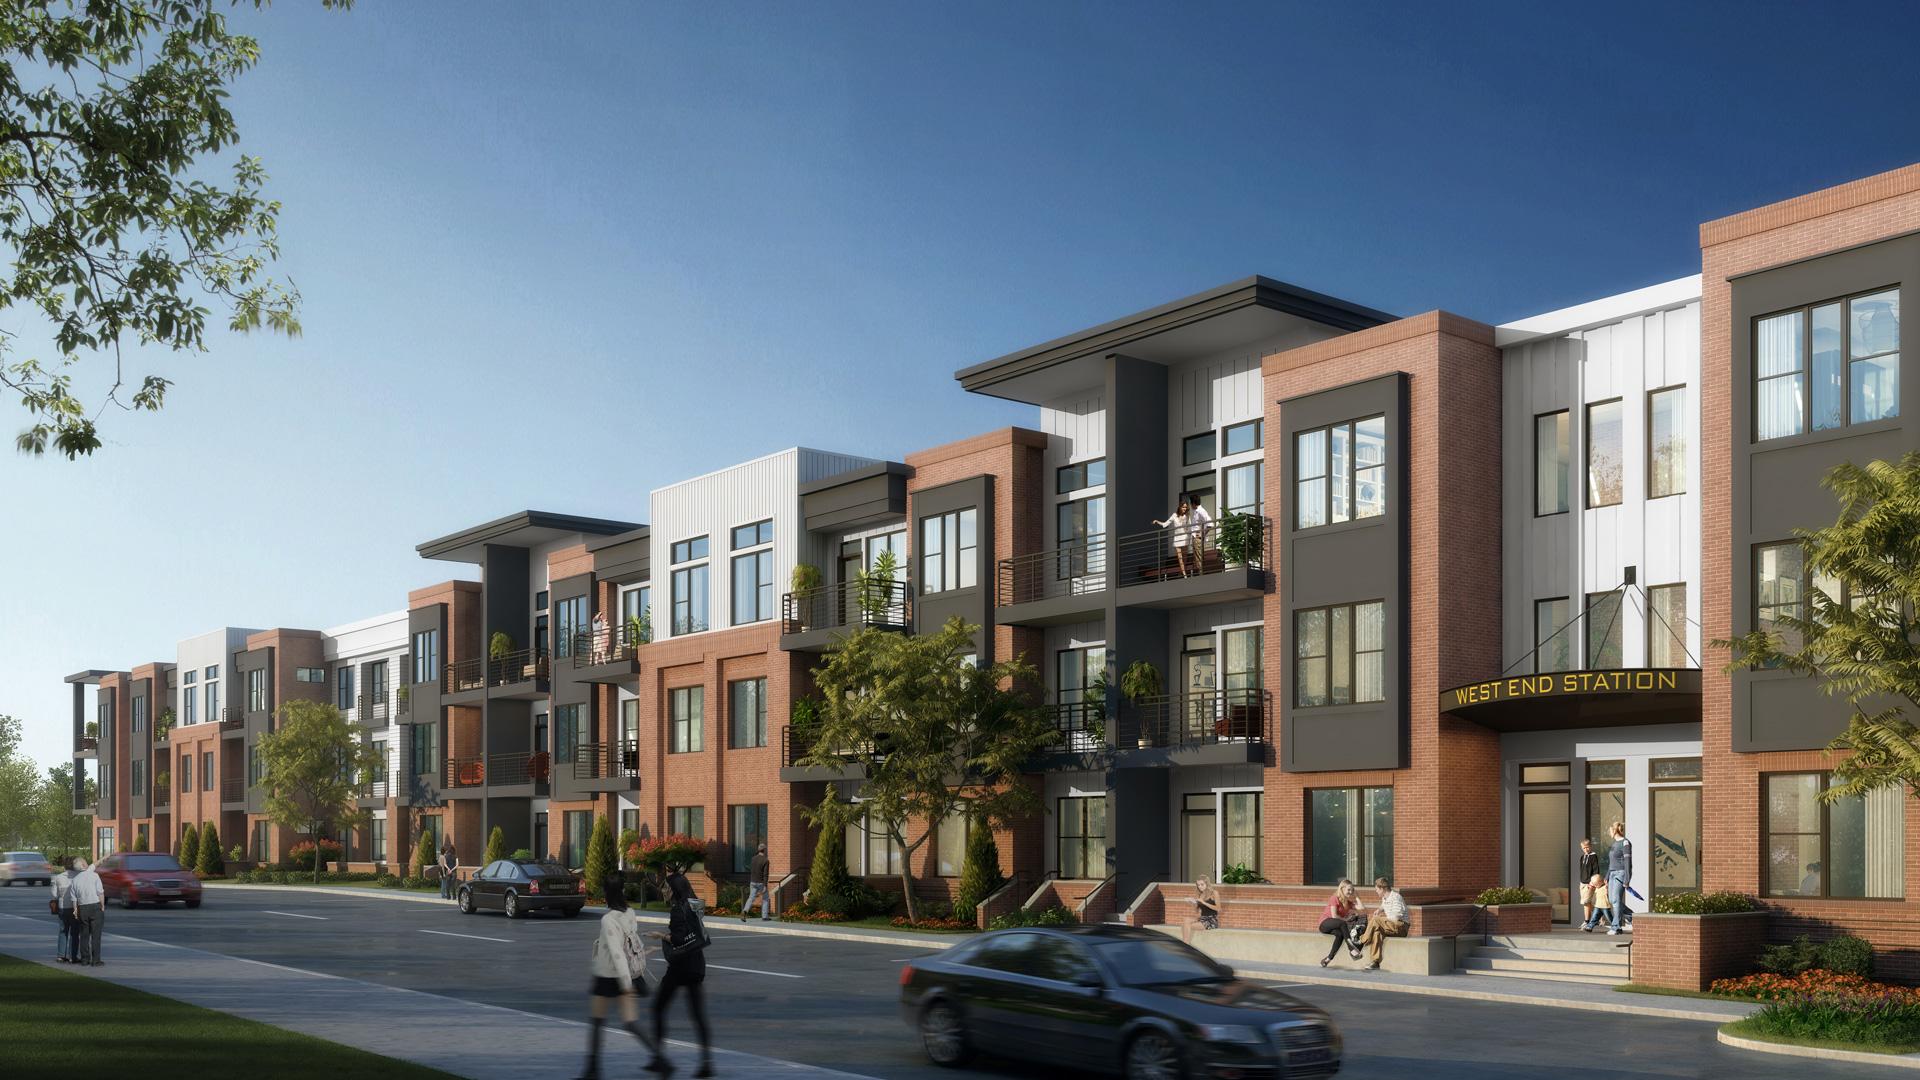 Lofts Downtown Greensboro Nc